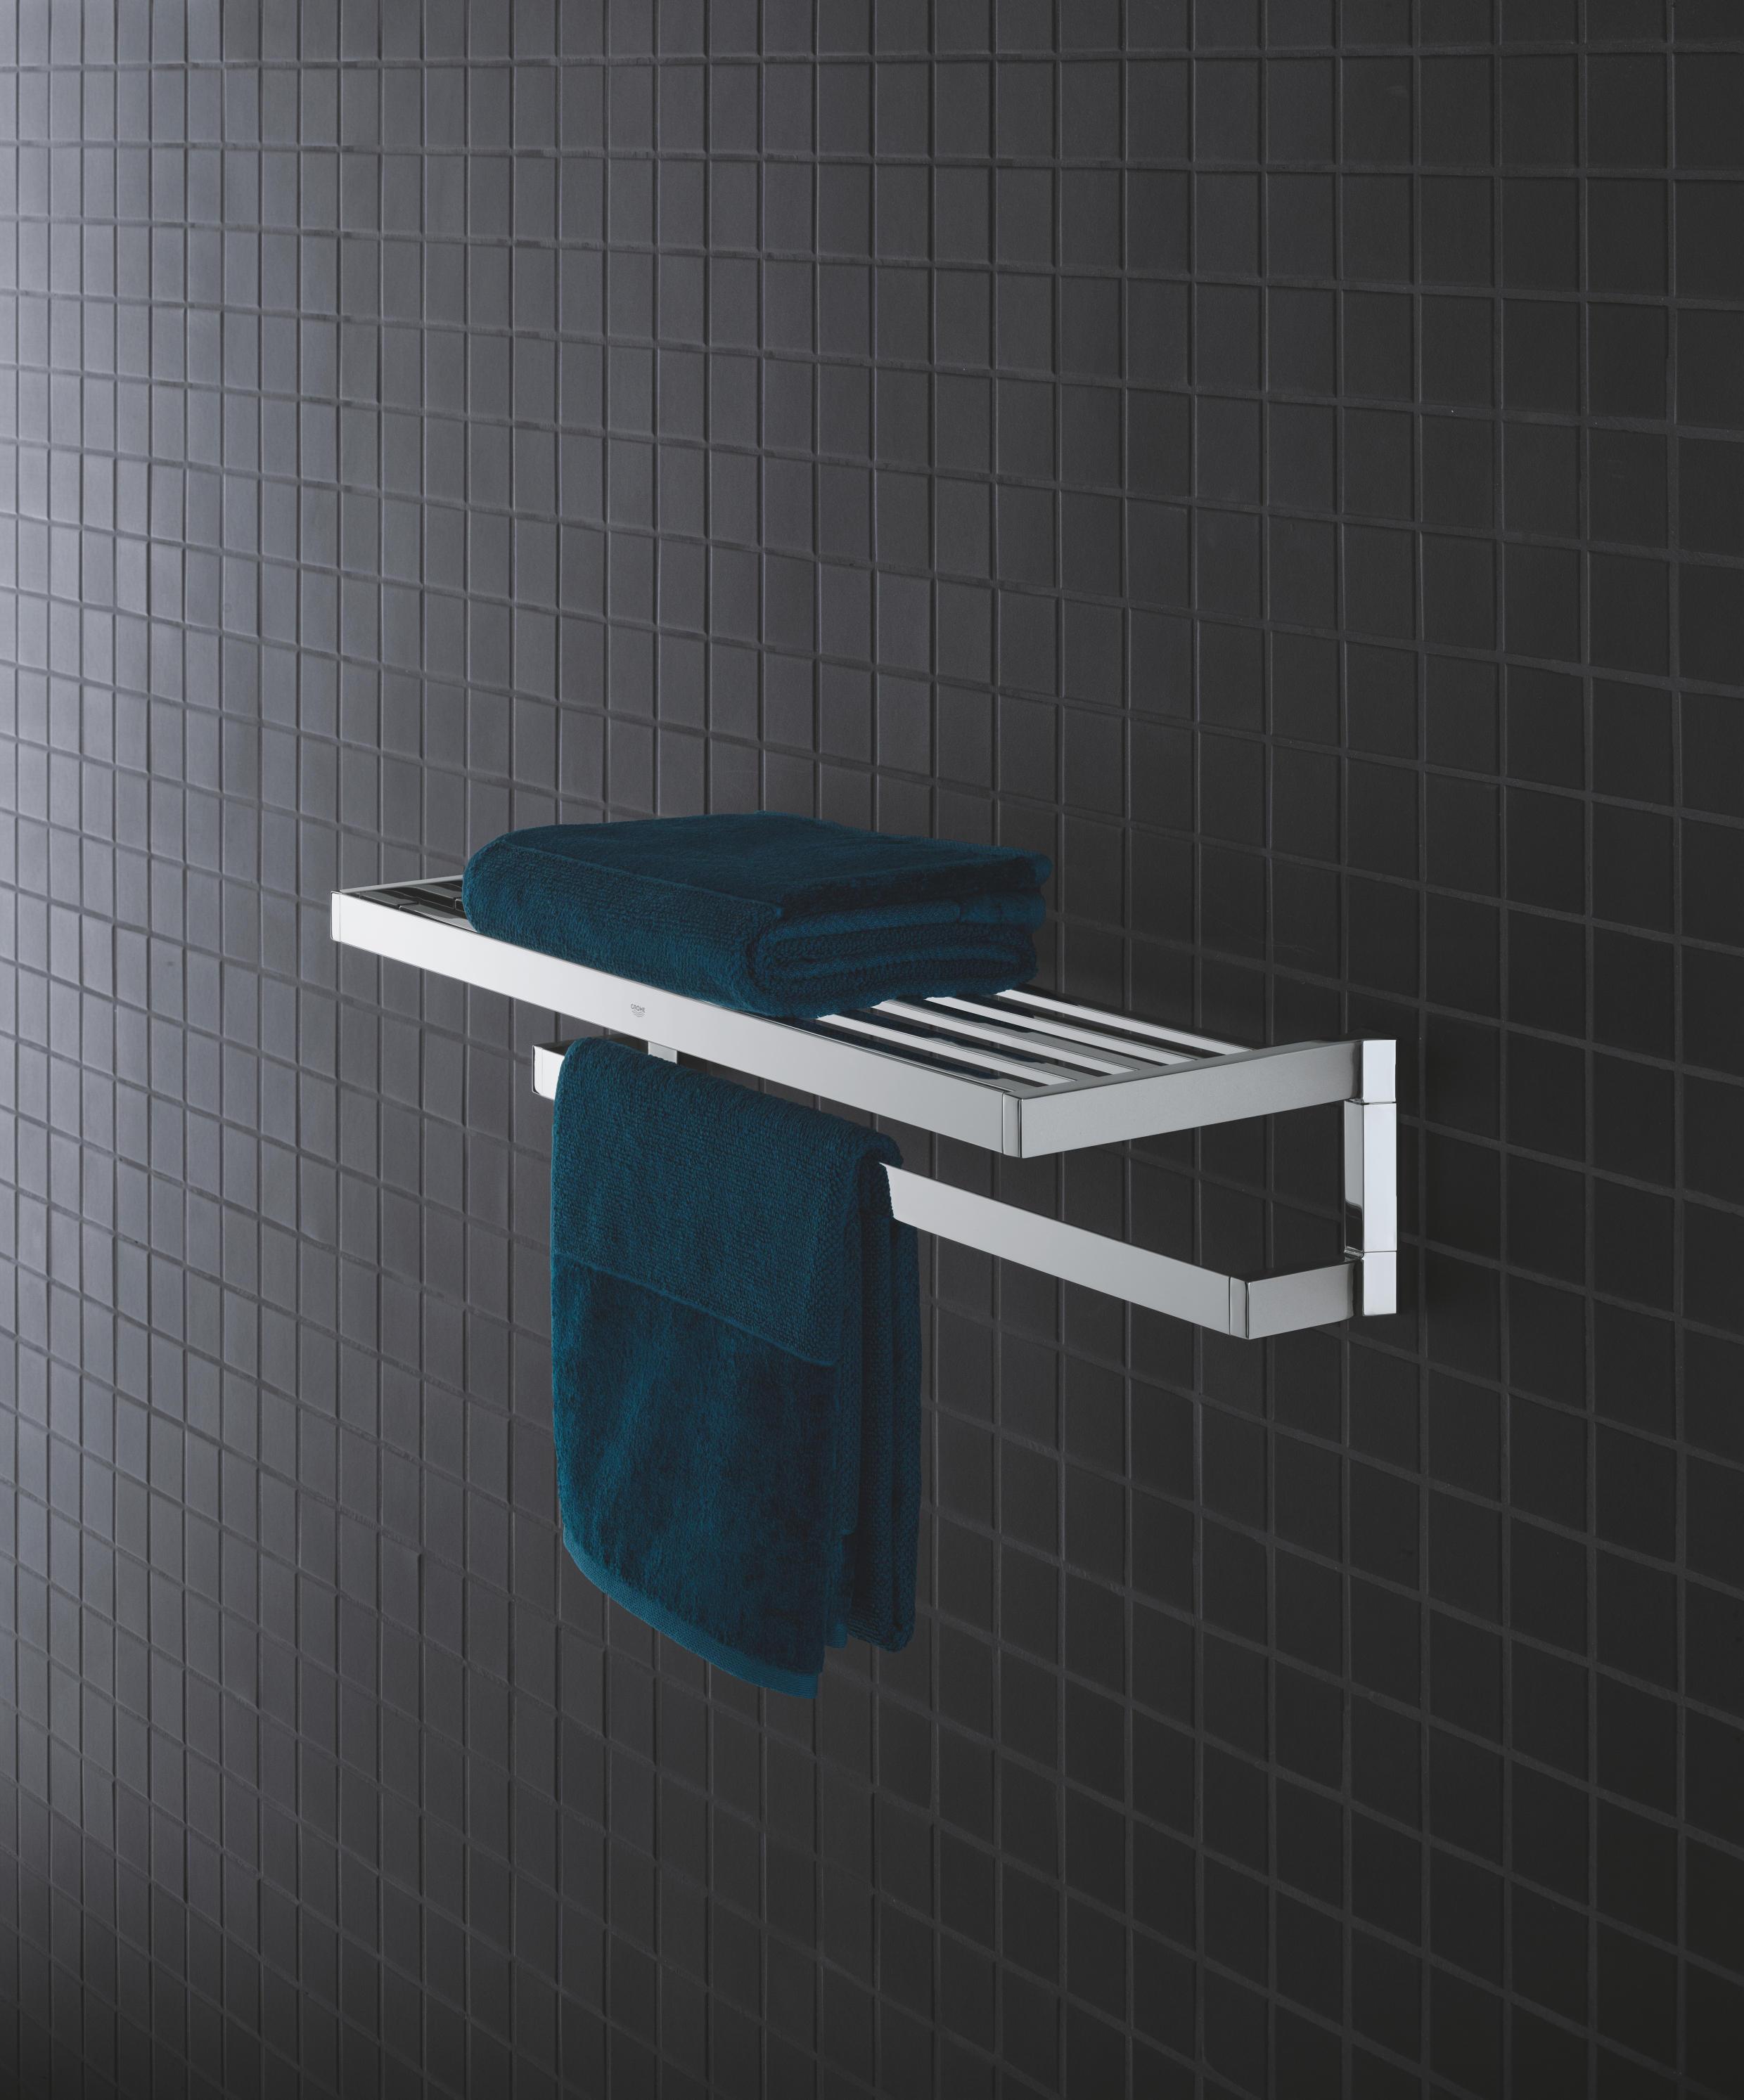 b bathroom soap rack logo